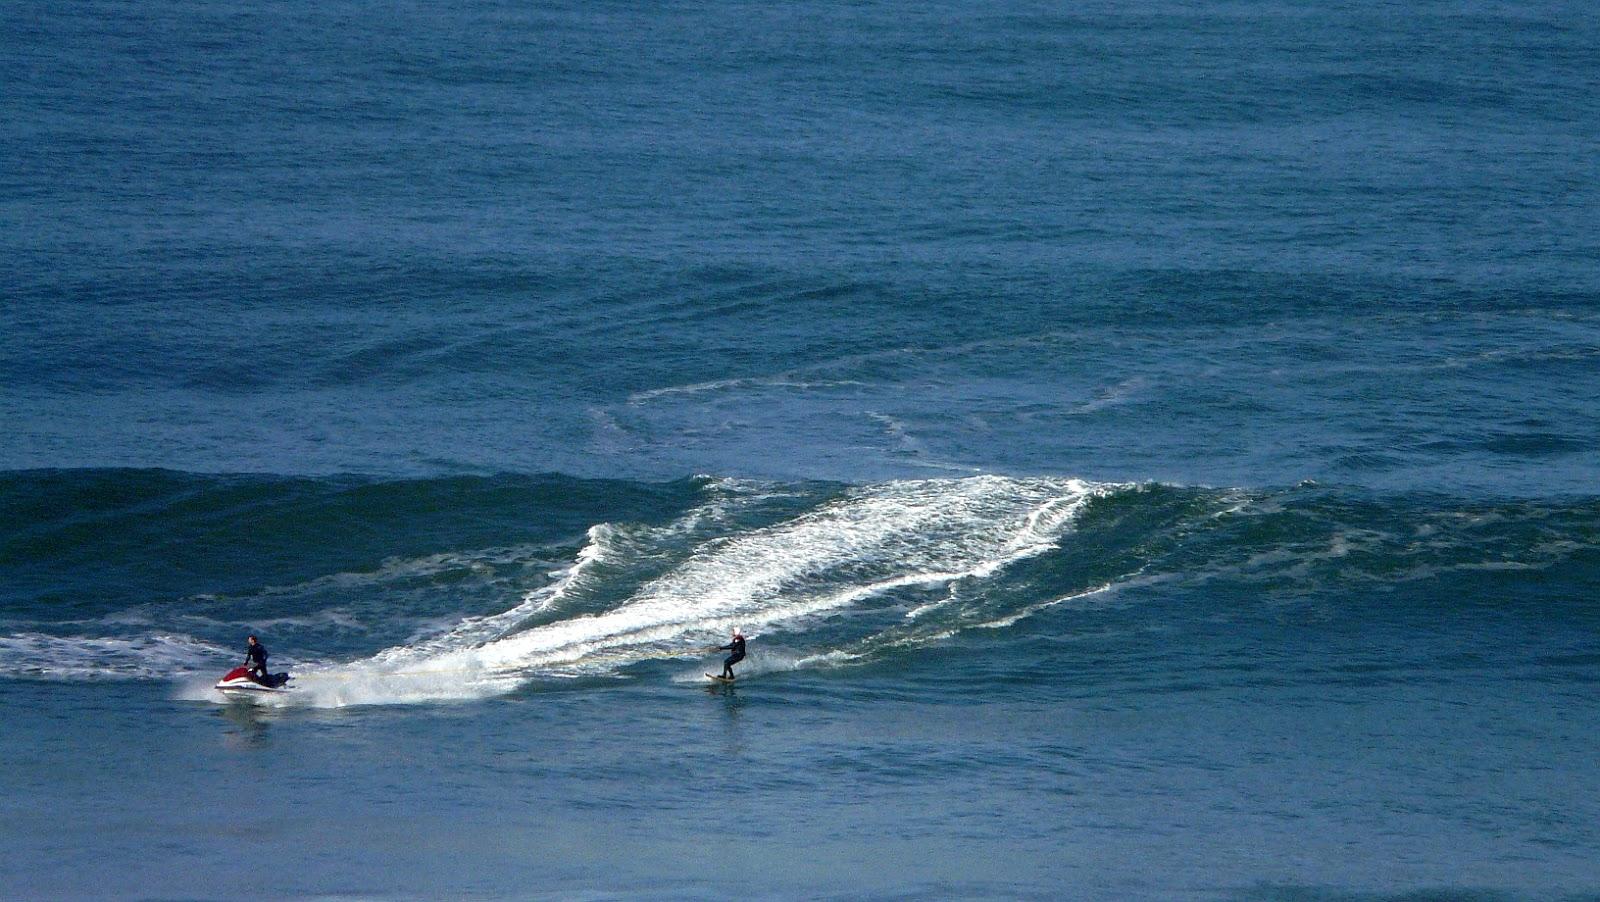 surf golf galea getxo bizkaia%2B%25288%2529